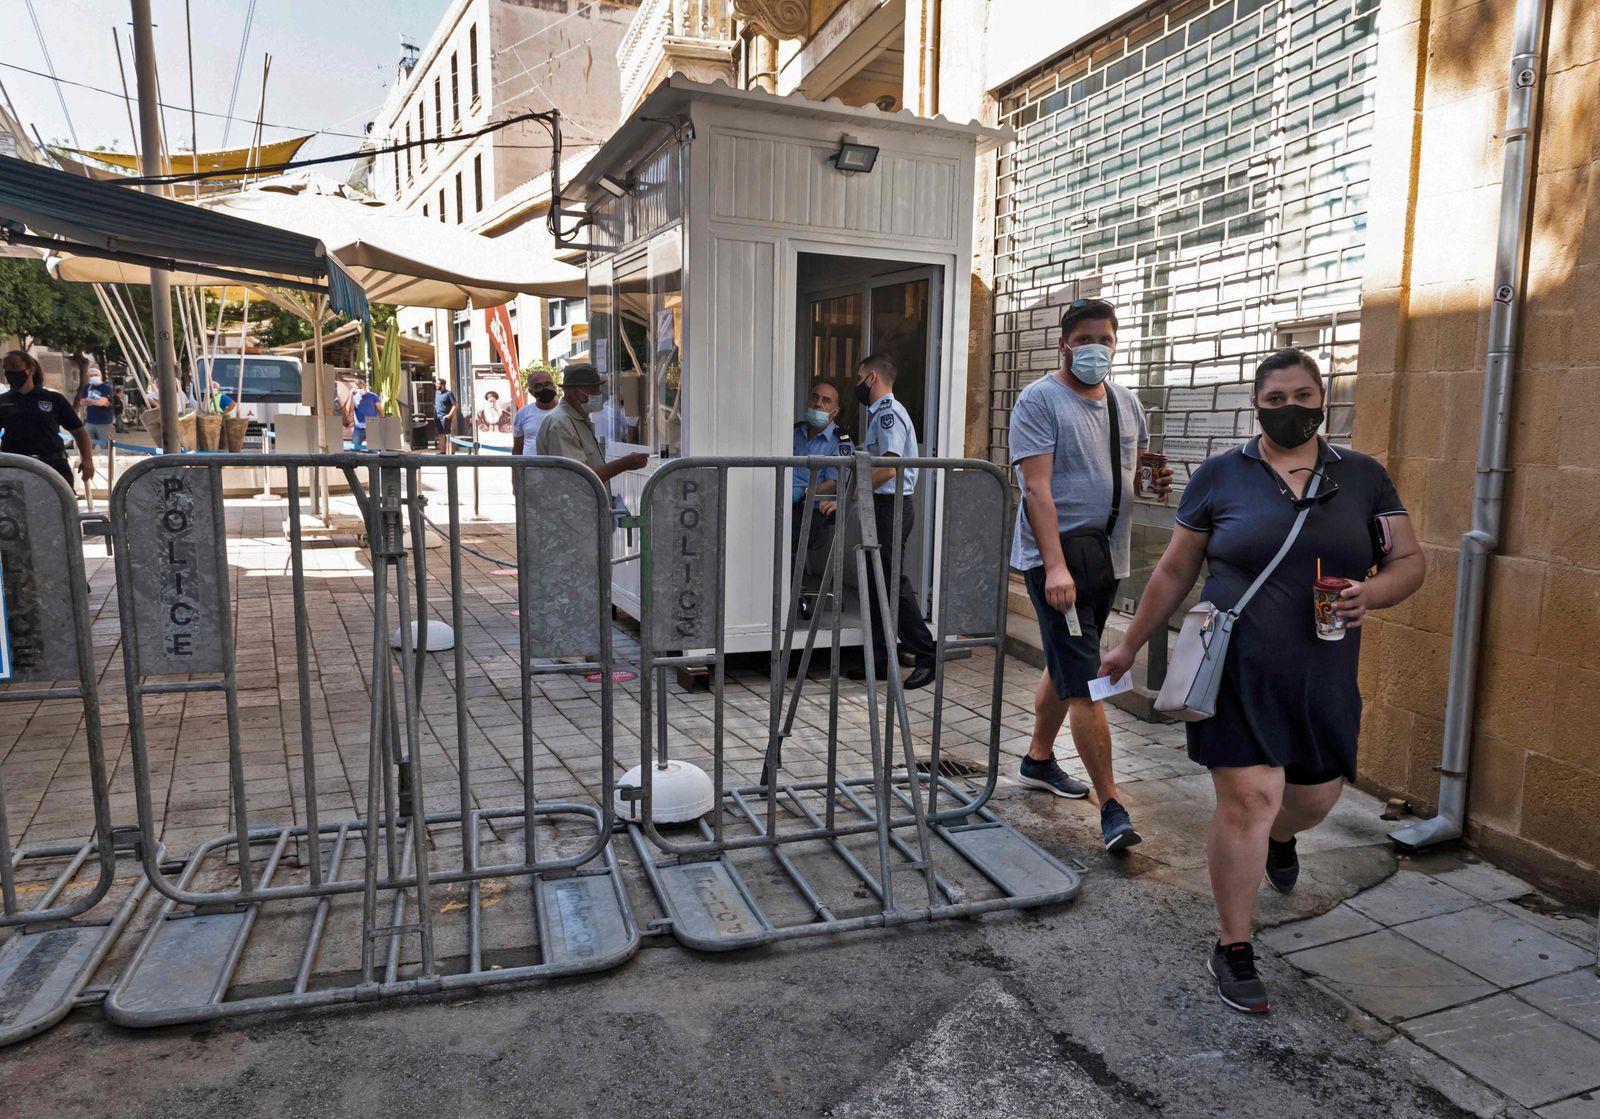 CYPRUS-CONFLICT-TURKEY-HEALTH-VIRUS